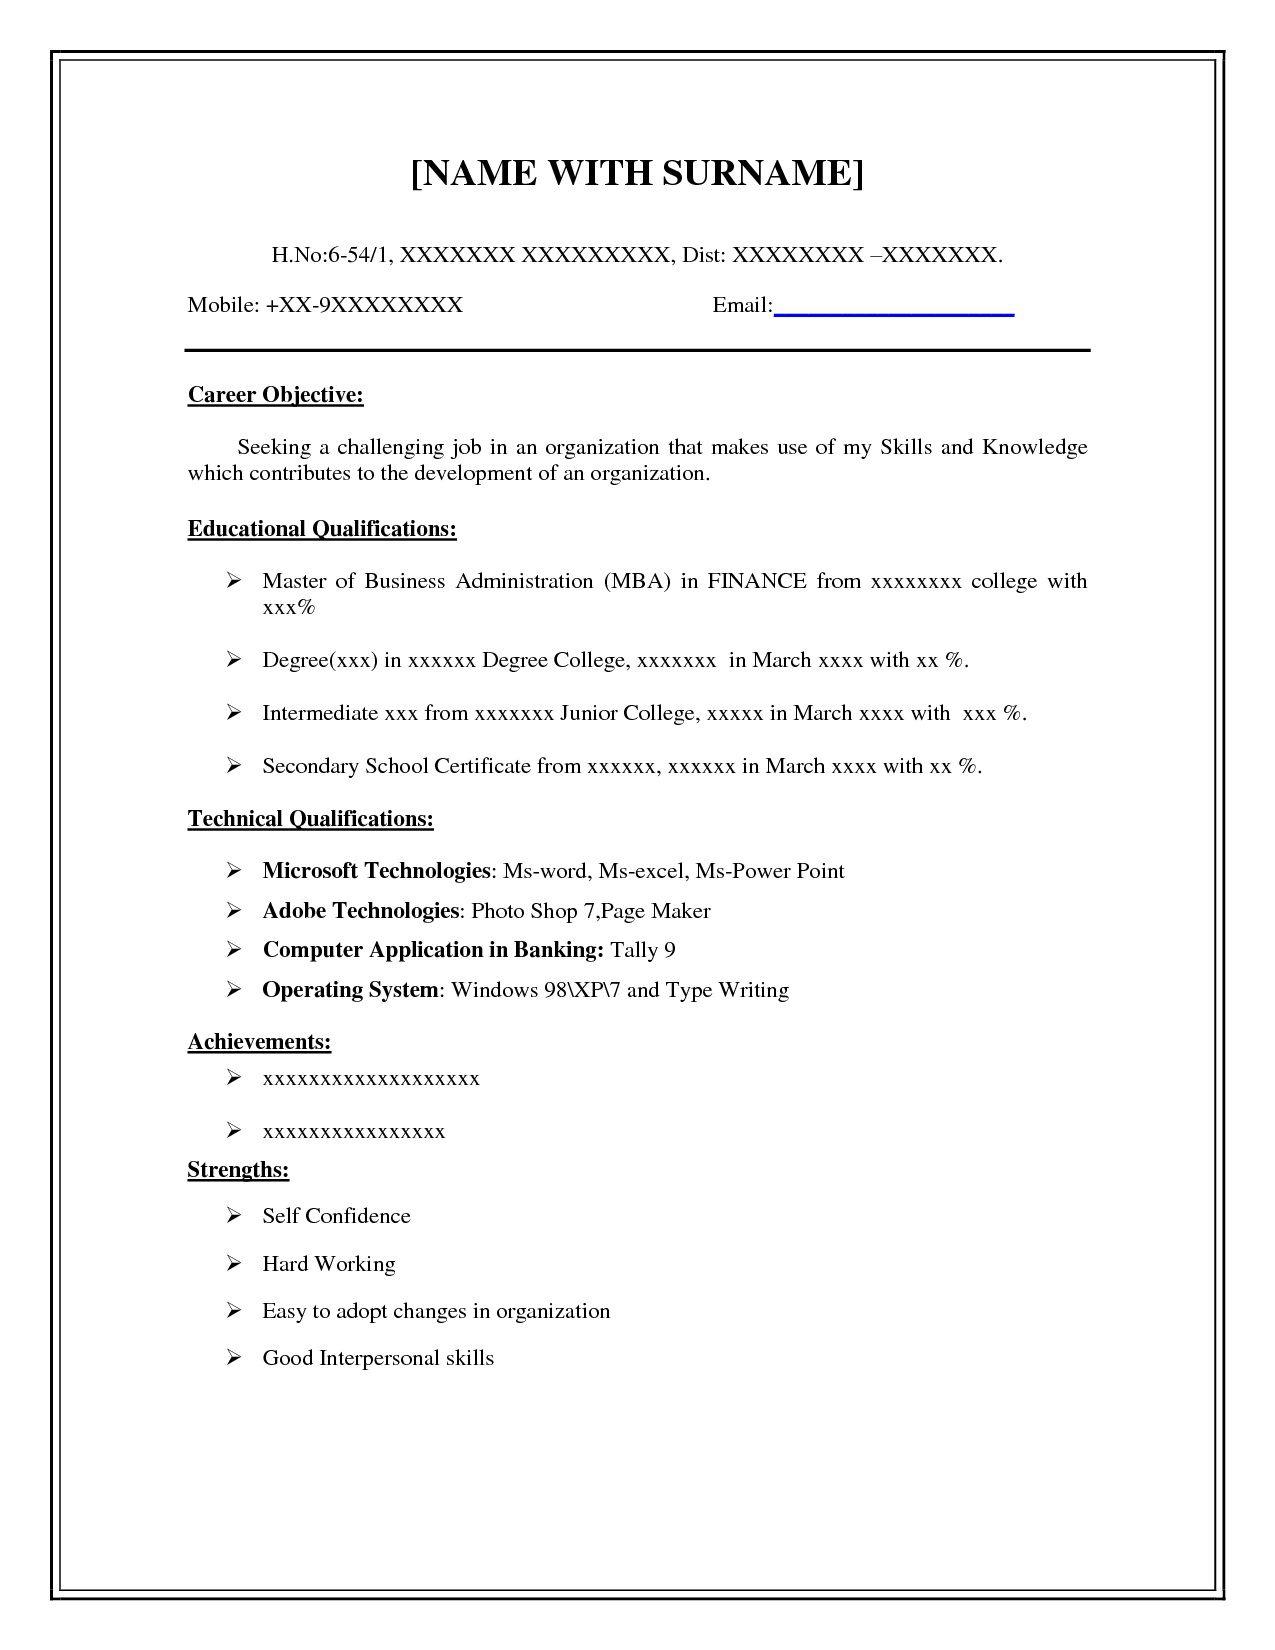 001 Wonderful Basic Resume Template Free High Def  Easy Download Word Australia DocFull